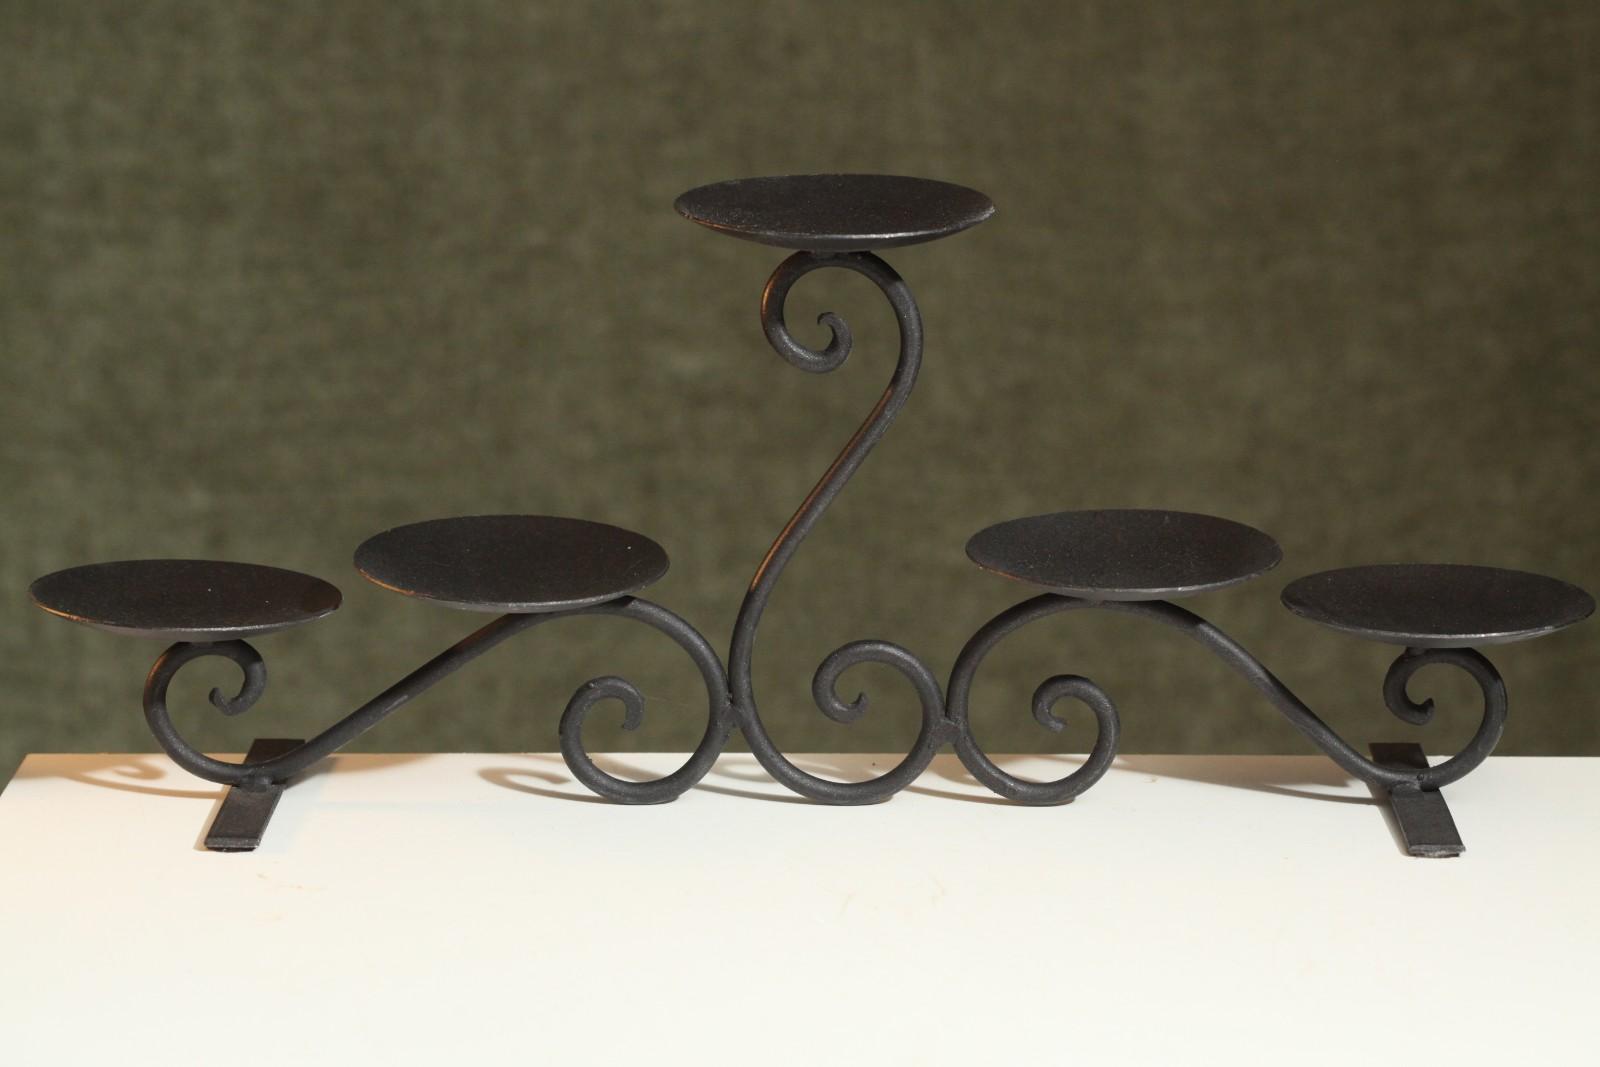 Metal Candelabra 5 Tier Candle Holder Living Room Fireplace Mantel Home Decor Ebay